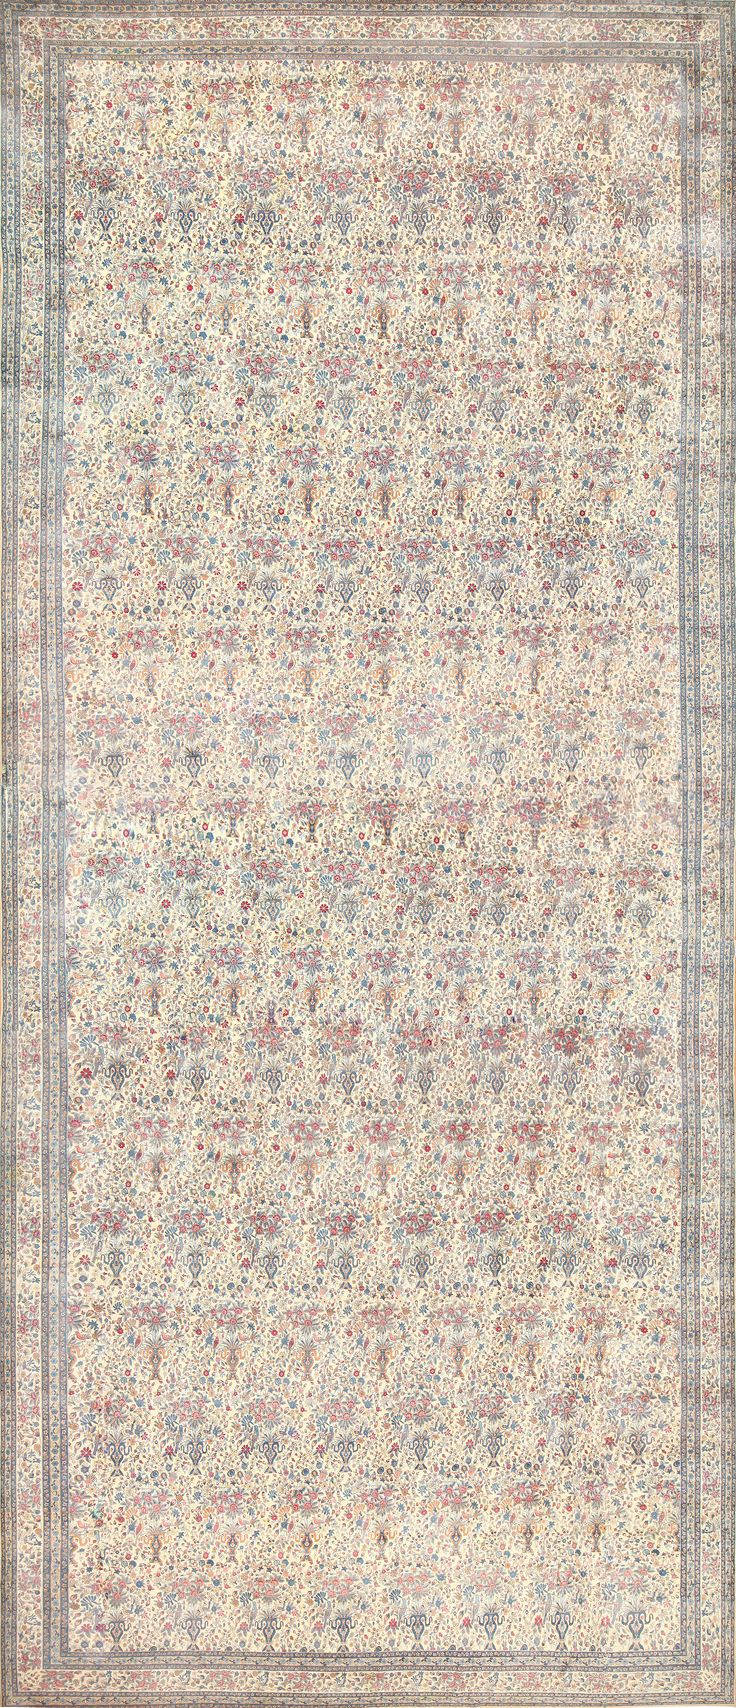 Palace size antique persian kerman rug 48370